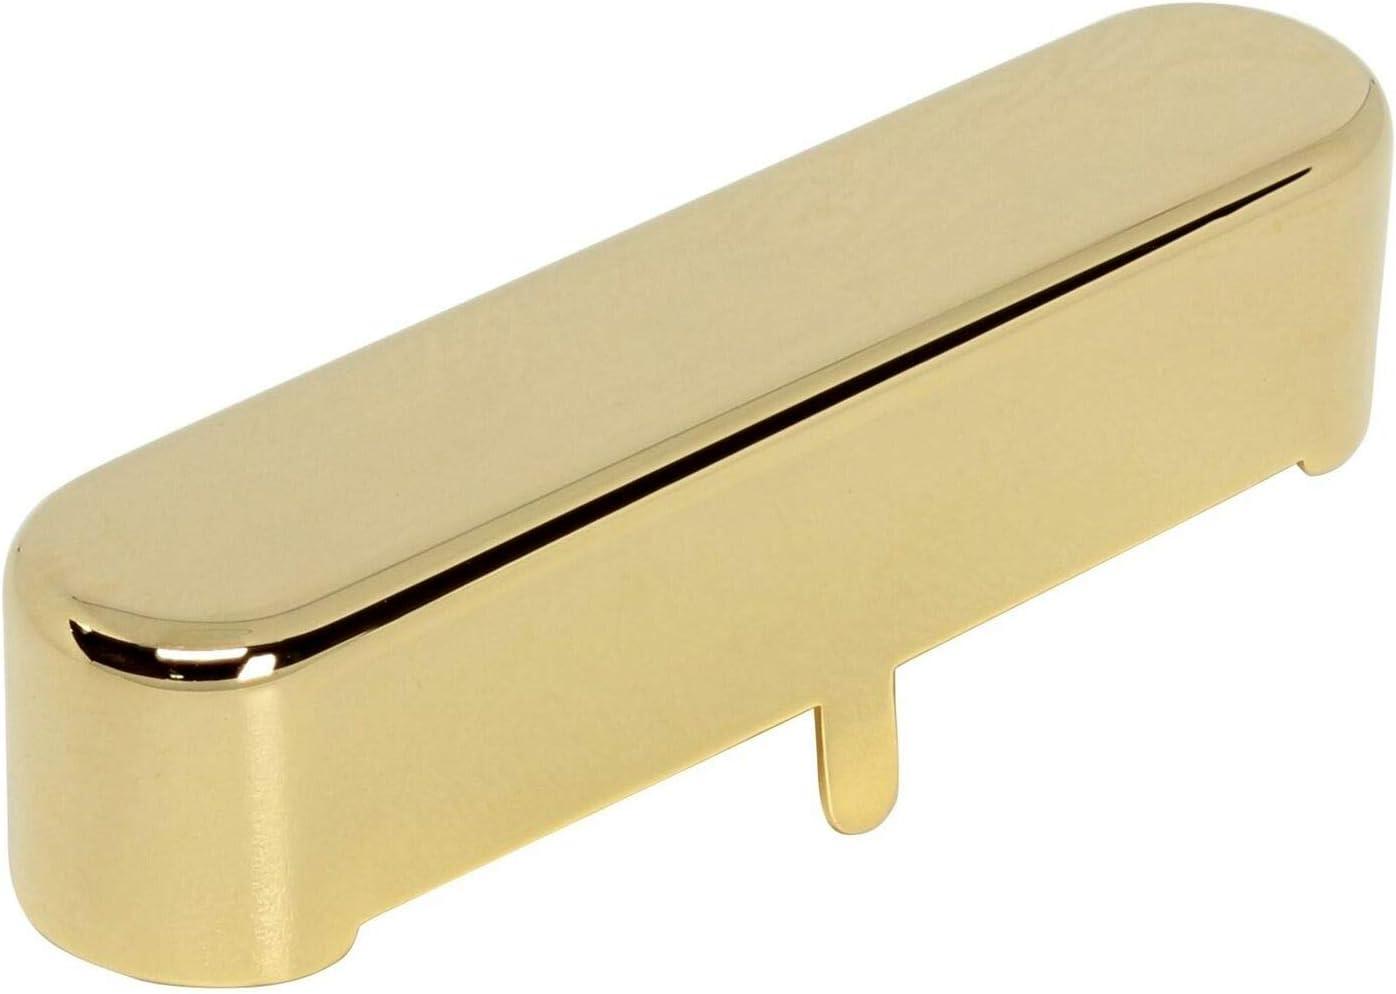 Long Skirt Max 48% OFF Telecaster Neck gift Cover gold Pickup